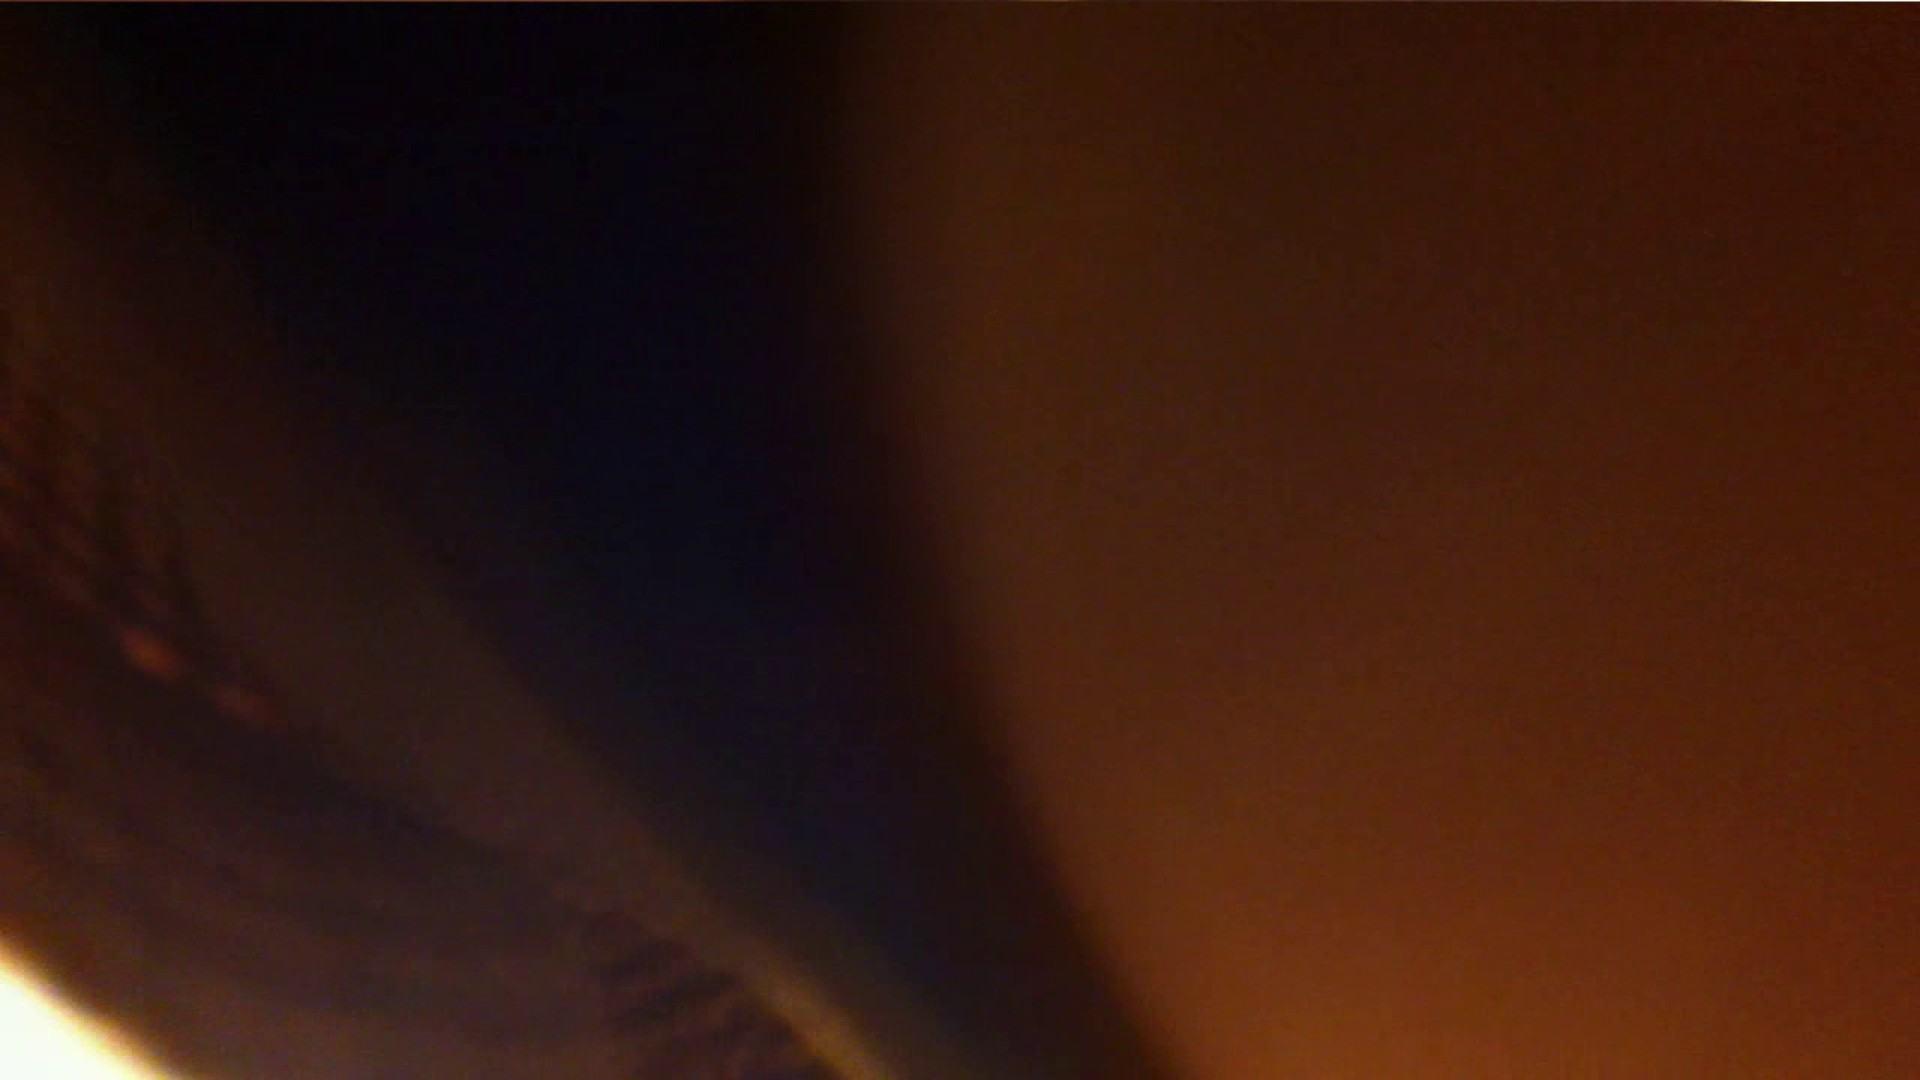 vol.34 美人アパレル胸チラ&パンチラ メガネ属性っていいよね♥ パンチラ 濡れ場動画紹介 66PICs 57